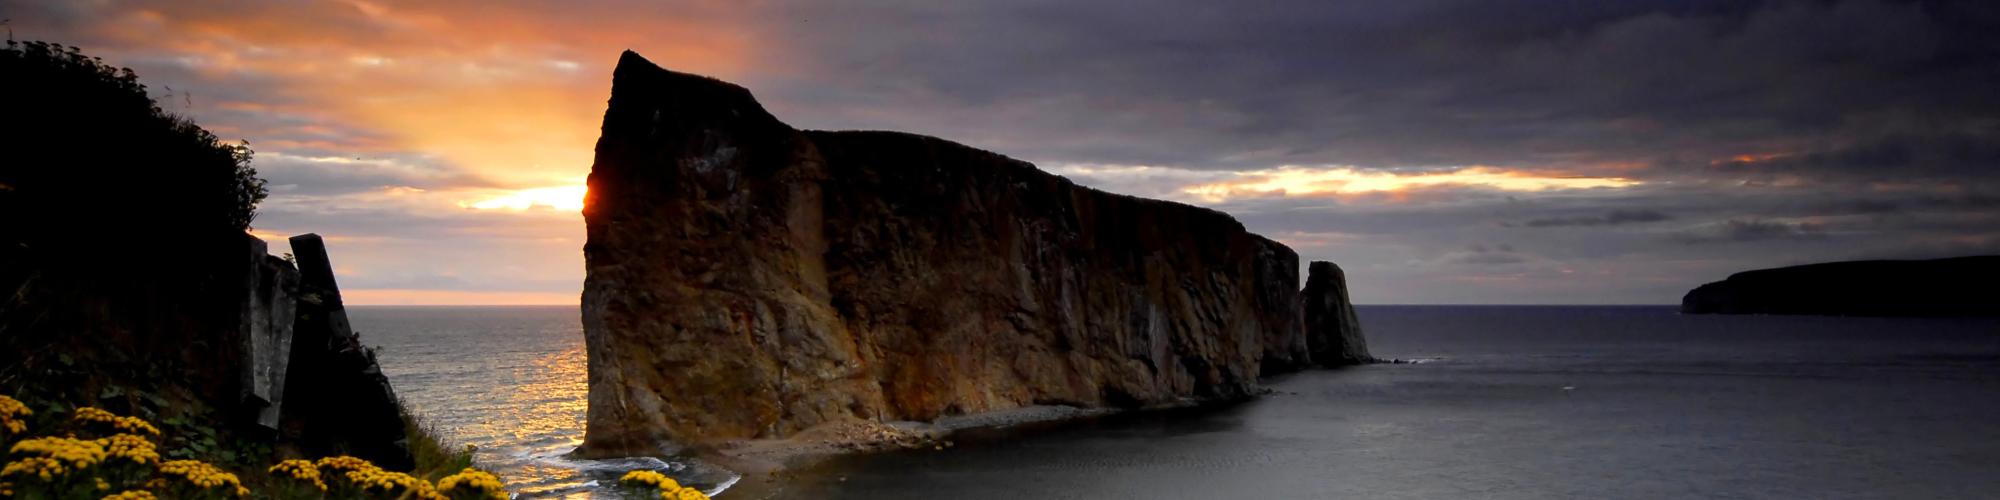 Paysage, rocher Percé